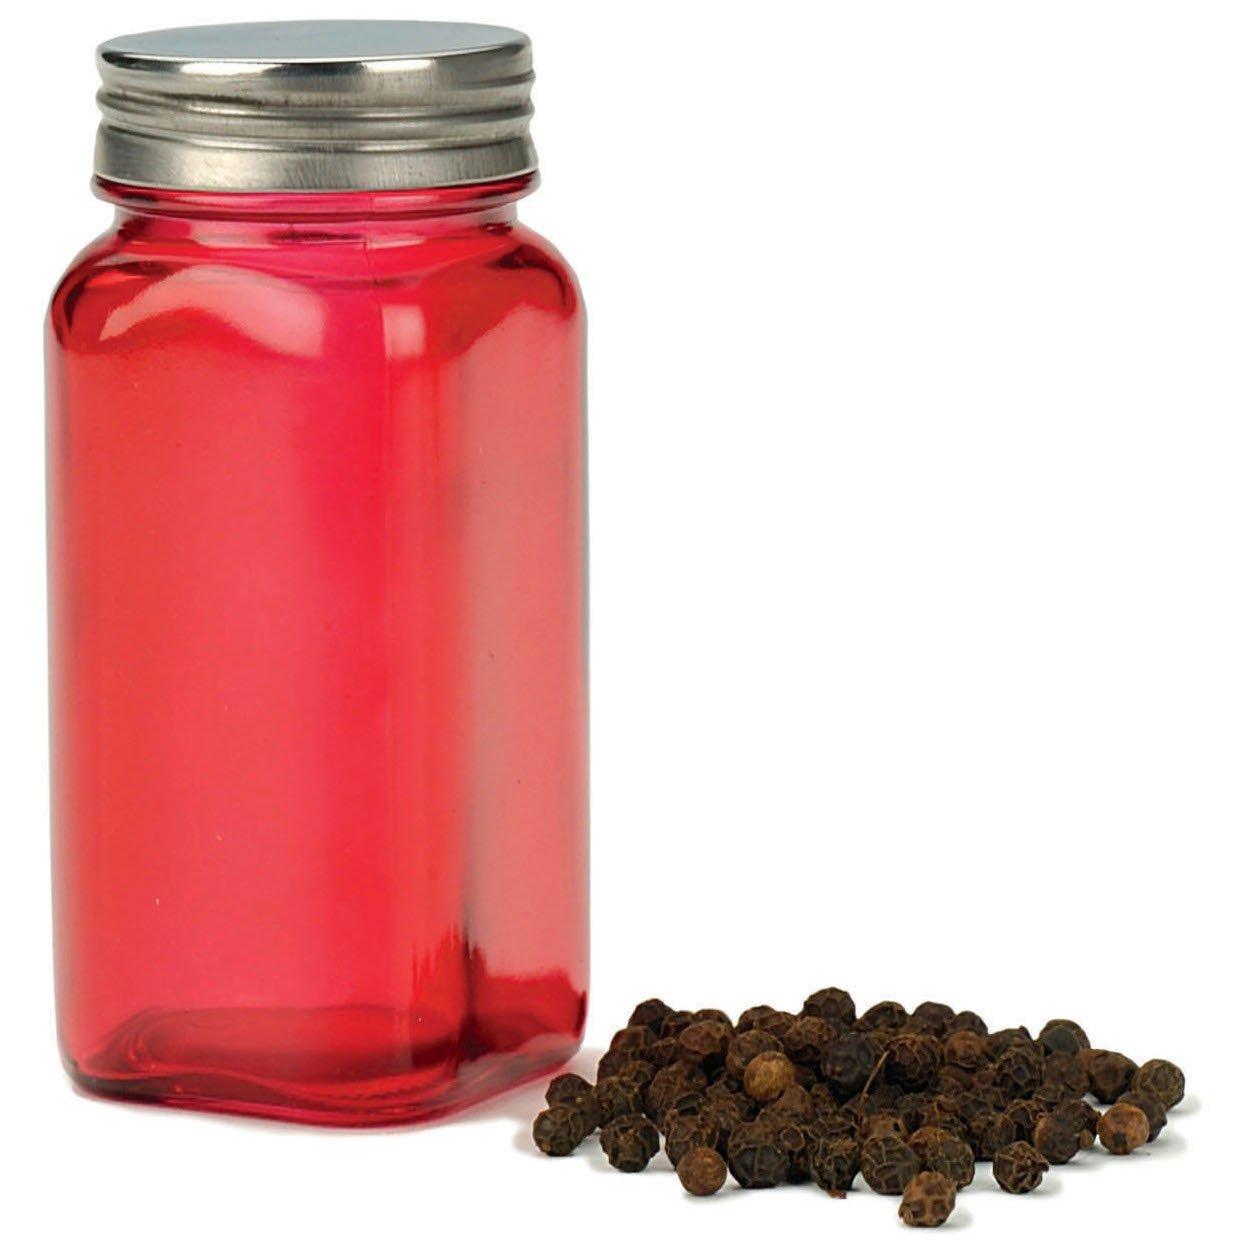 RSVP Red Glass Square Spice Jar, Set of 6